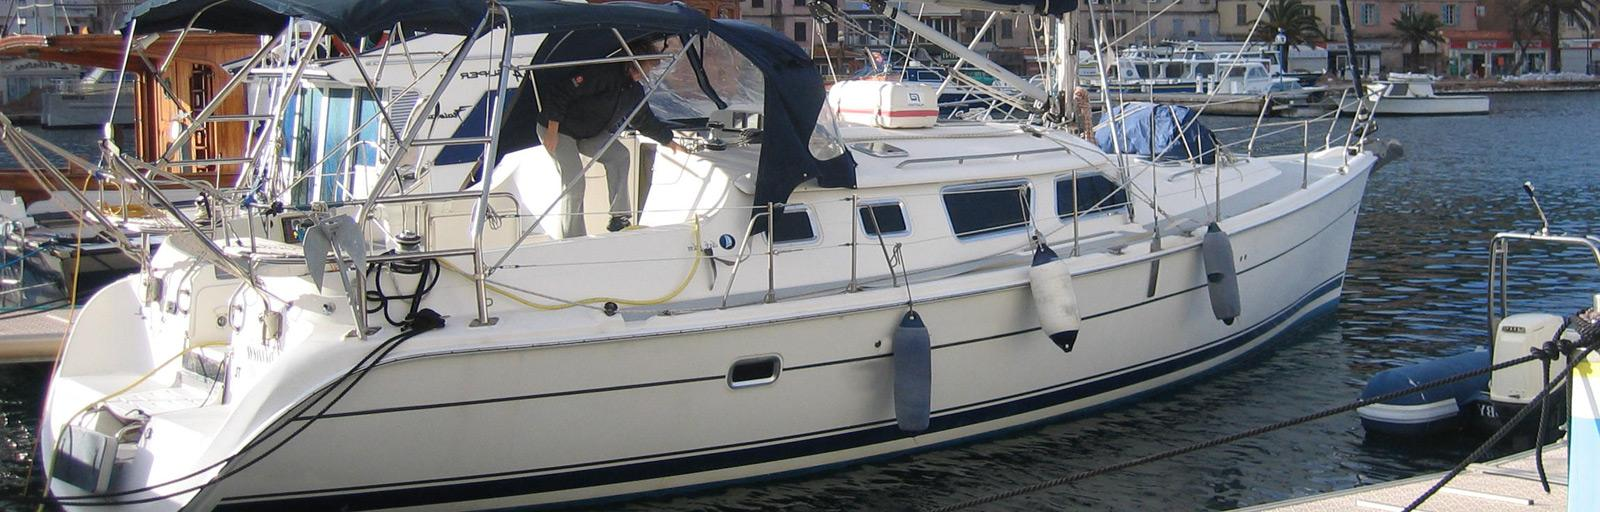 Hunter 426 DS - AYC Yachtbroker